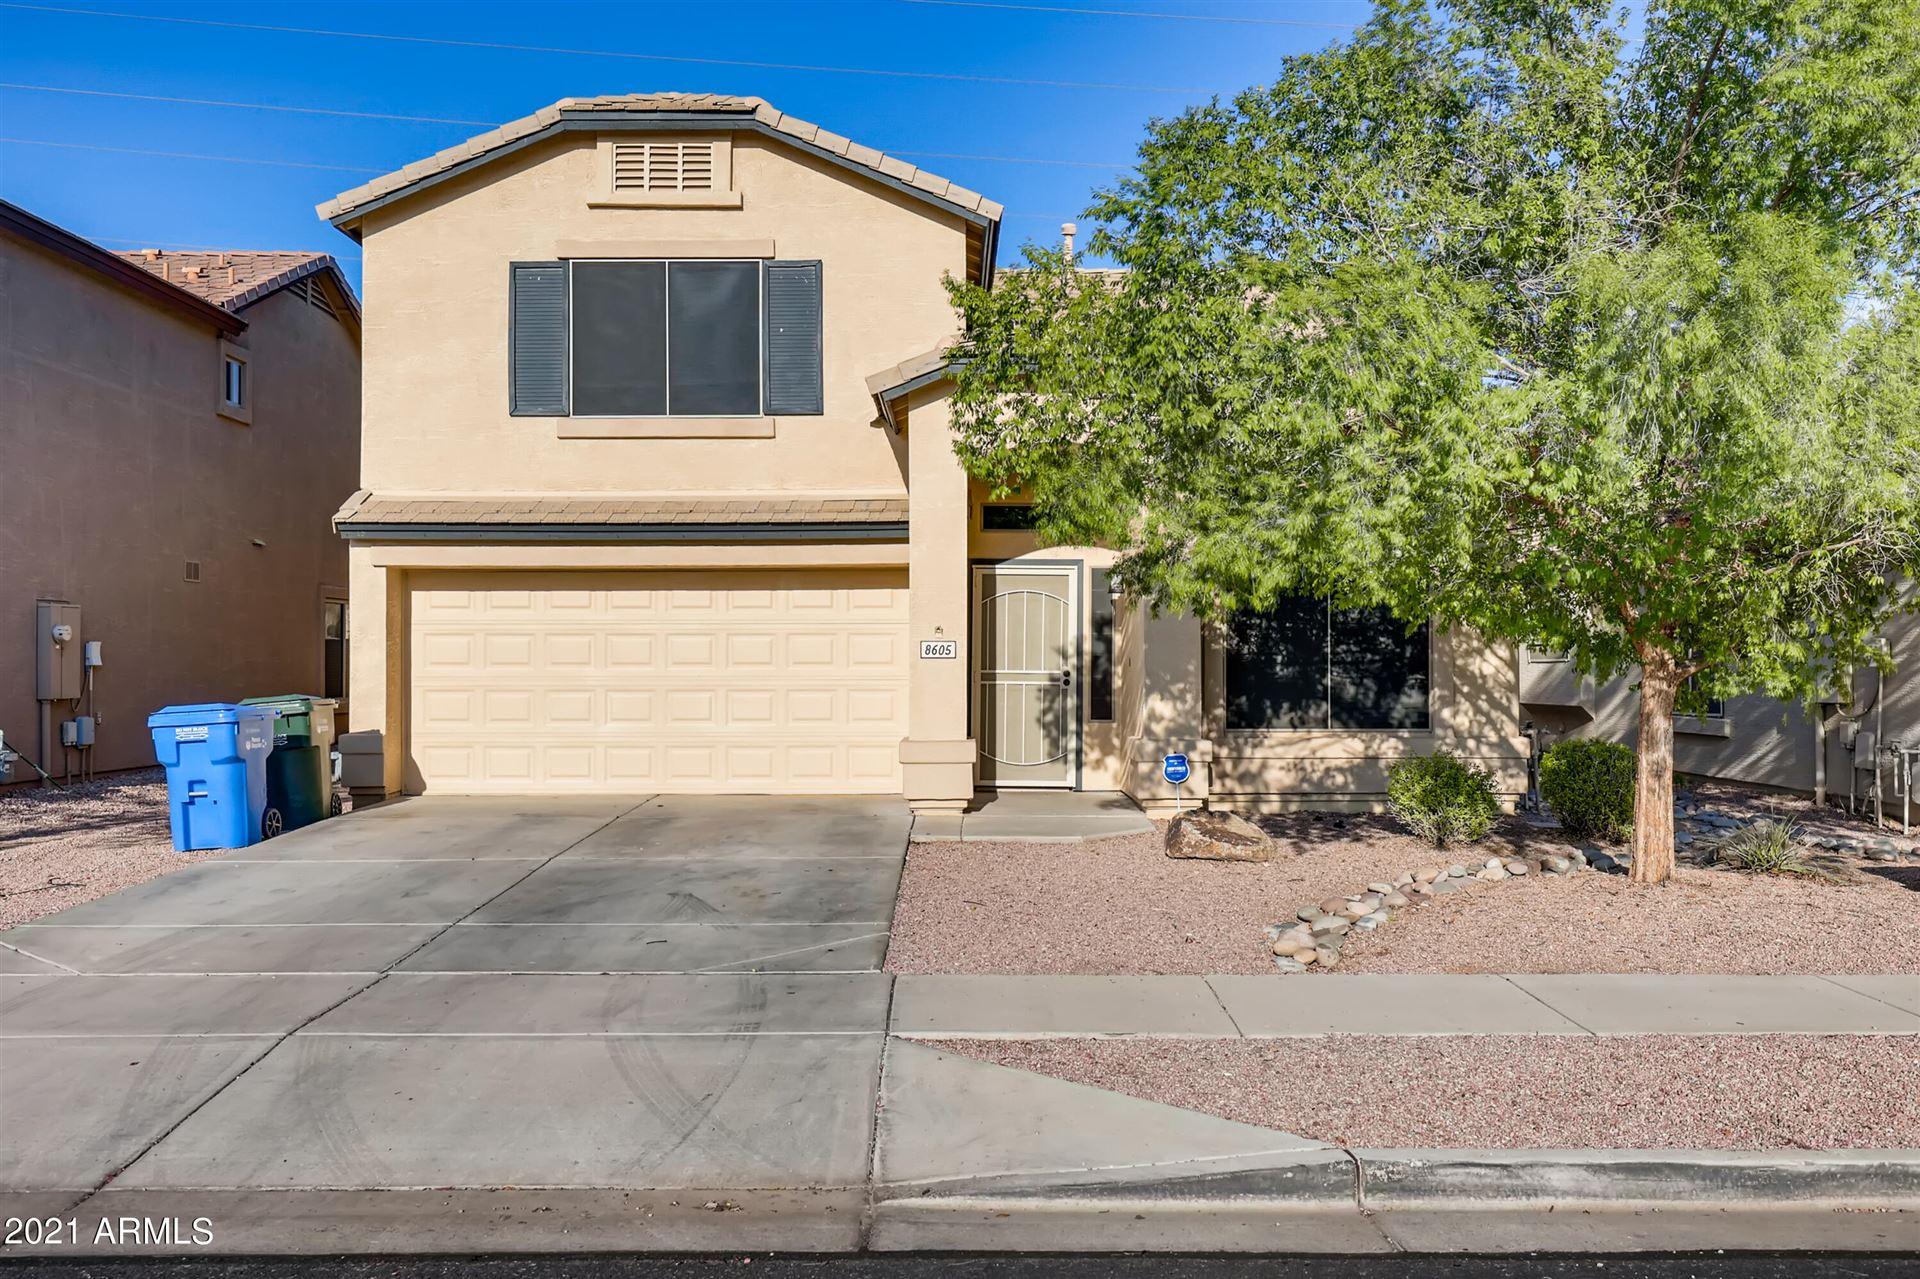 Photo of 8605 S 49TH Drive, Laveen, AZ 85339 (MLS # 6269879)